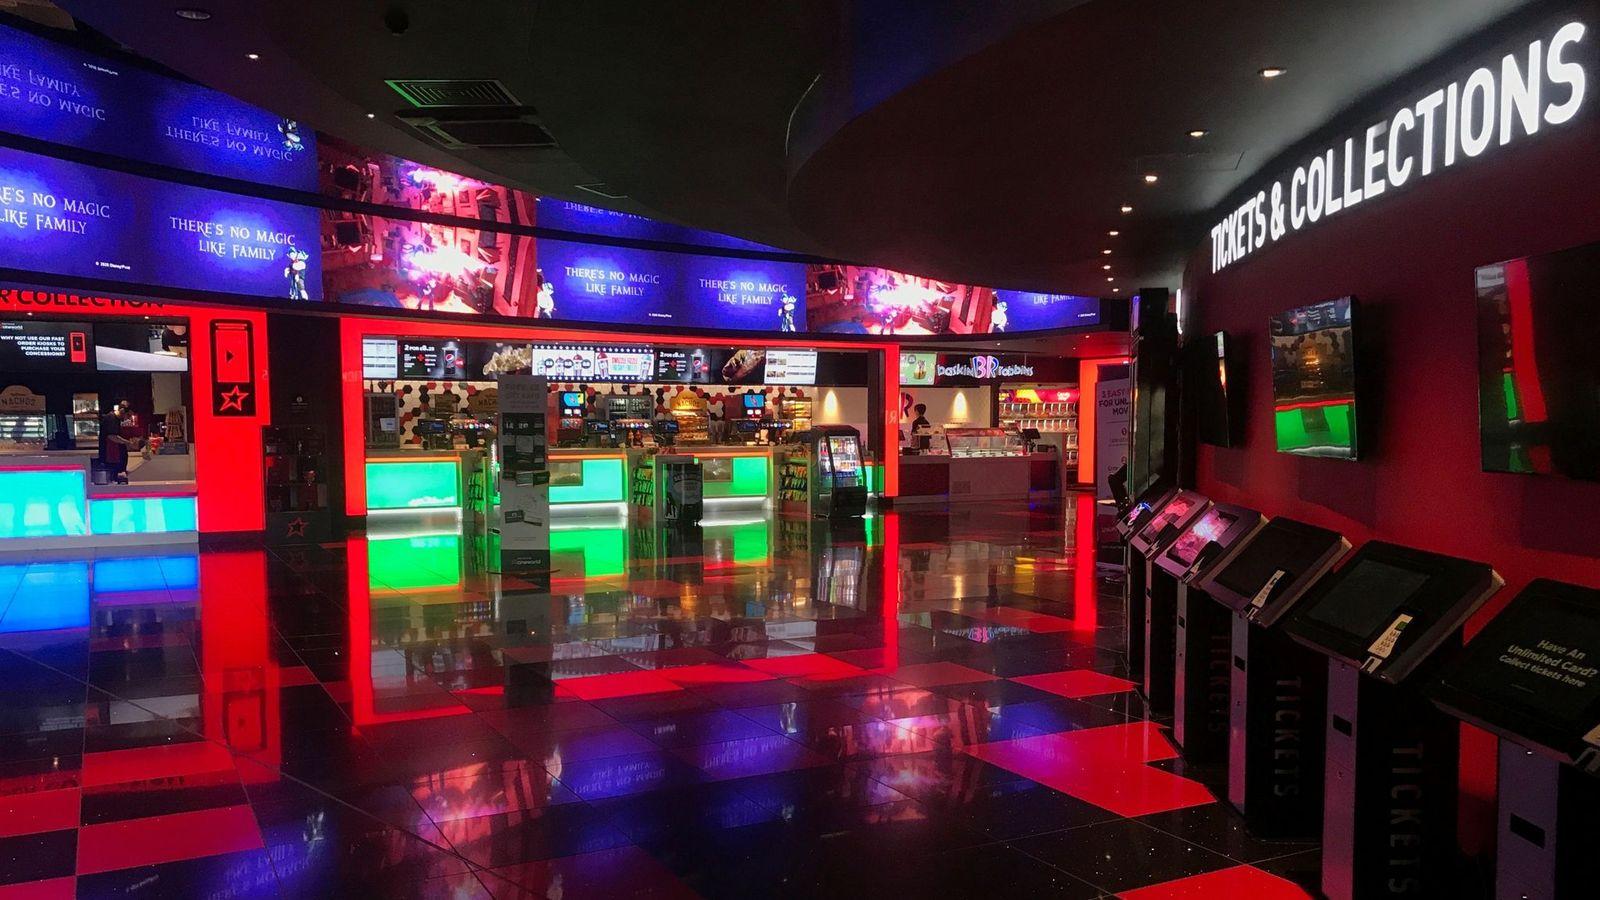 Cineworld screens AlixPartners for talks on $8bn debt pile